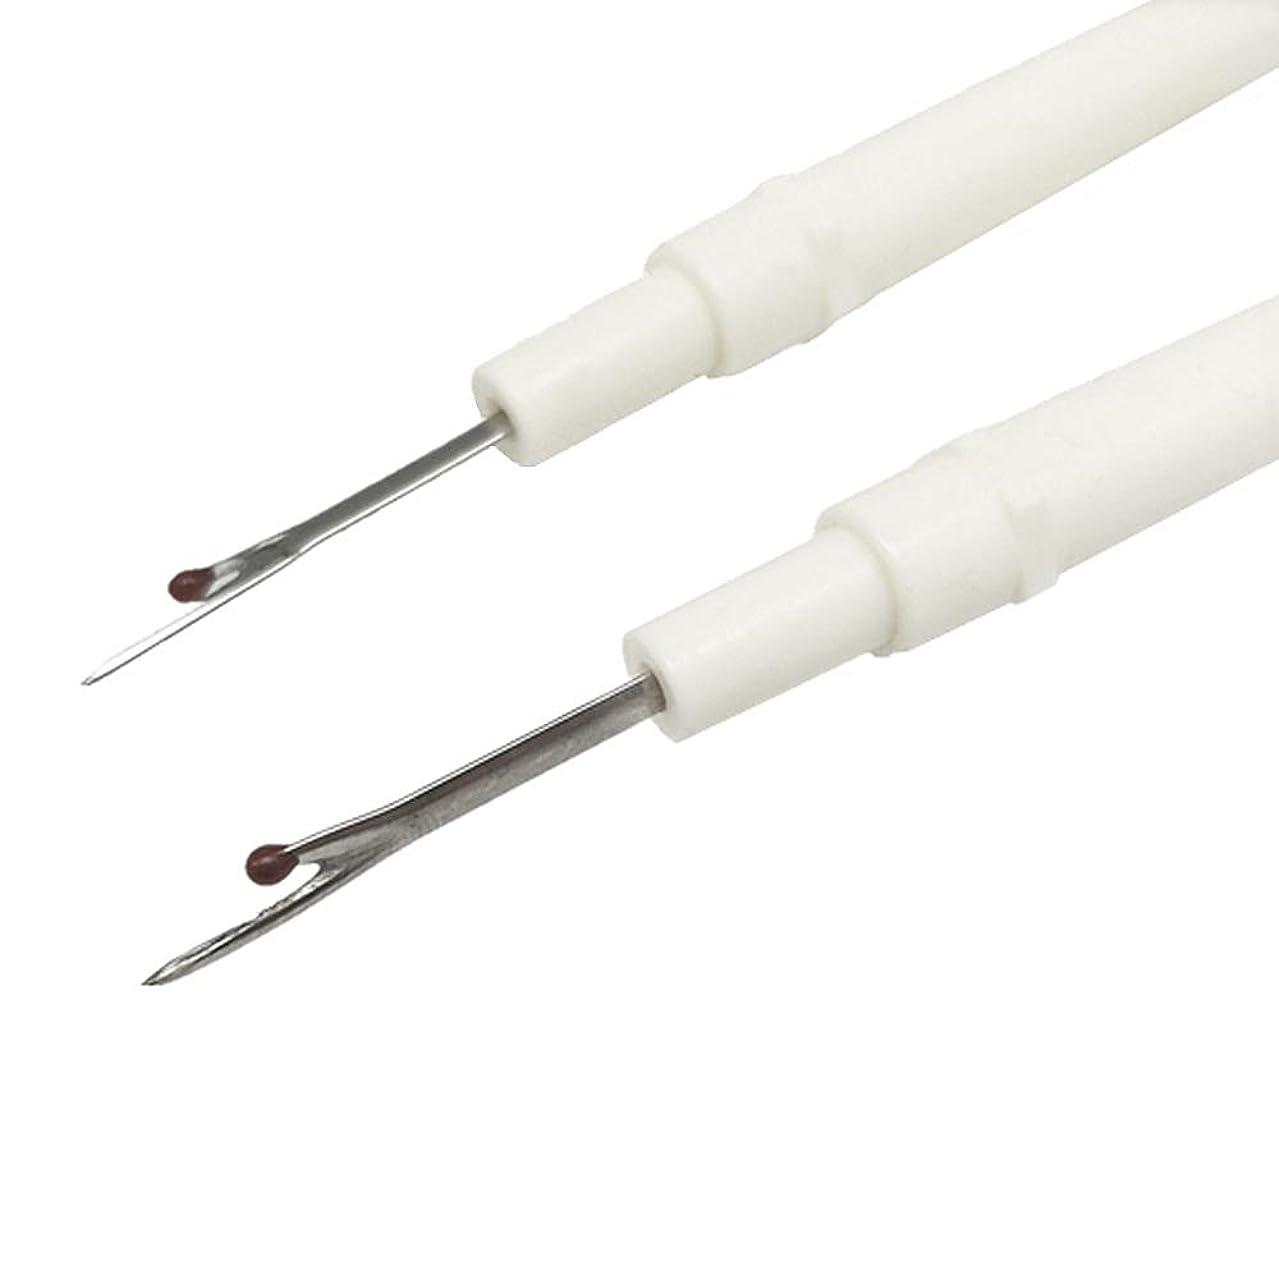 YEQIN 20PCS Hot Plastic Handle Craft Thread Cutter Seam Ripper Stitch Ripper Sewing Tool 8x1cm(3-1/8